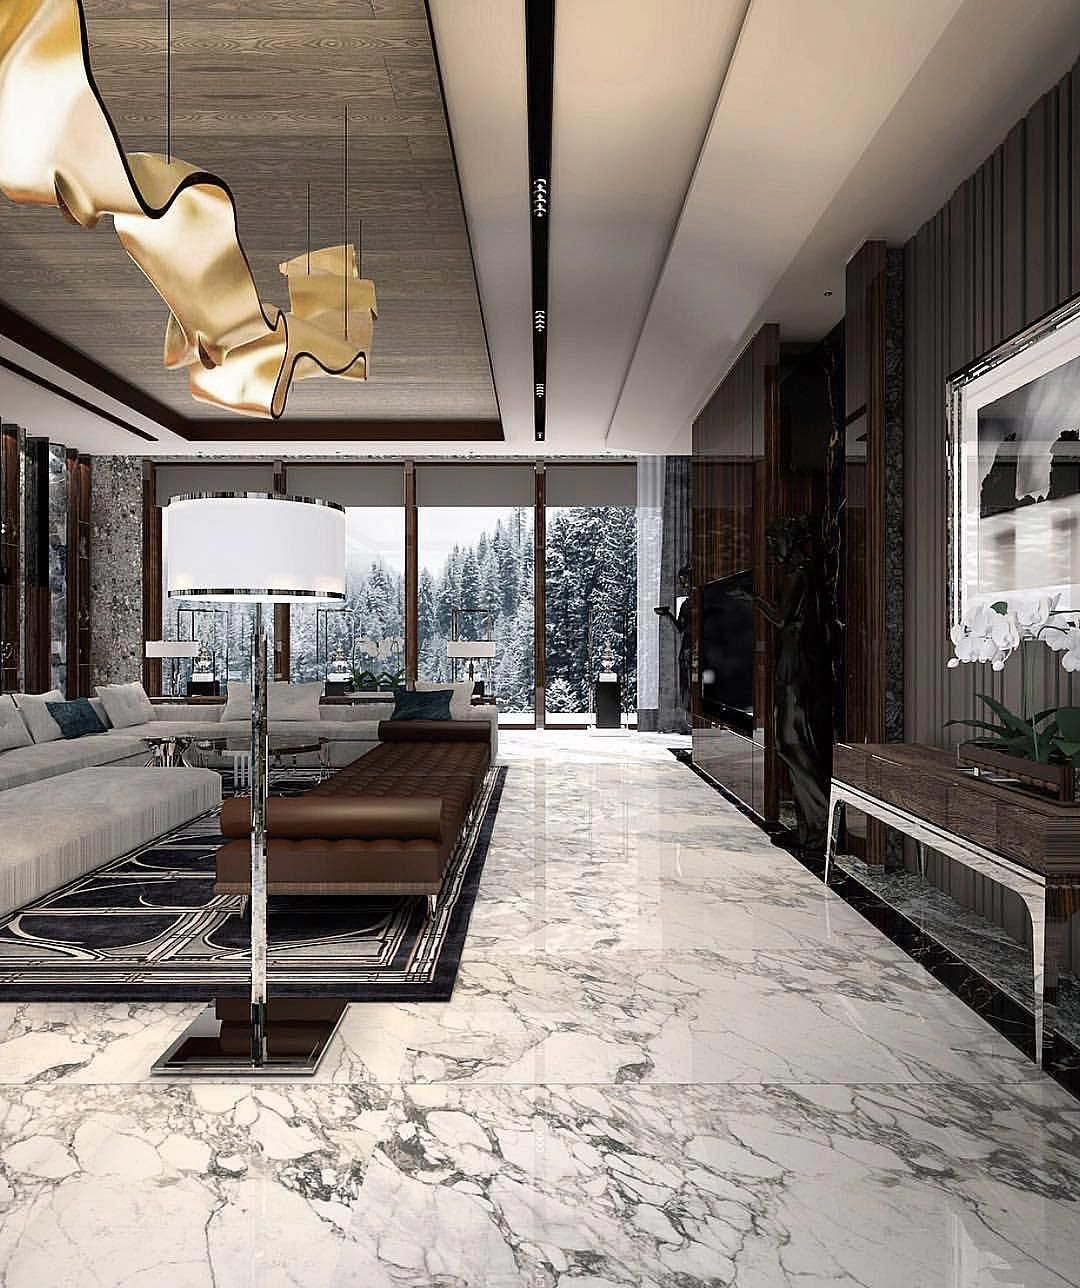 La imagen puede contener tabla e interior   Maison design, Idée ...